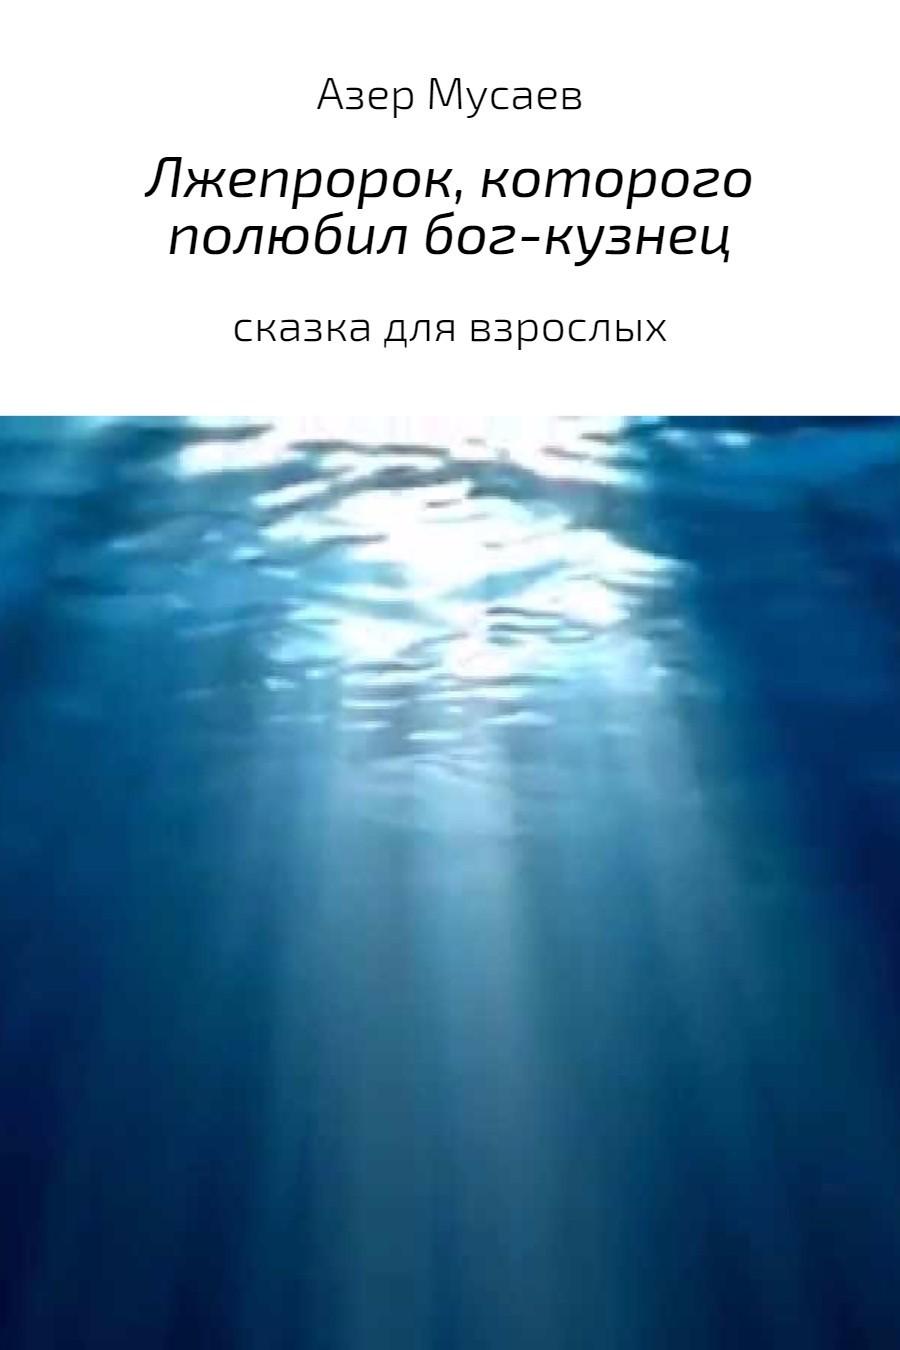 Азер Азилхан оглы Мусаев Лжепророк, которого полюбил бог-кузнец азер азилхан оглы мусаев лжепророк которого полюбил бог кузнец